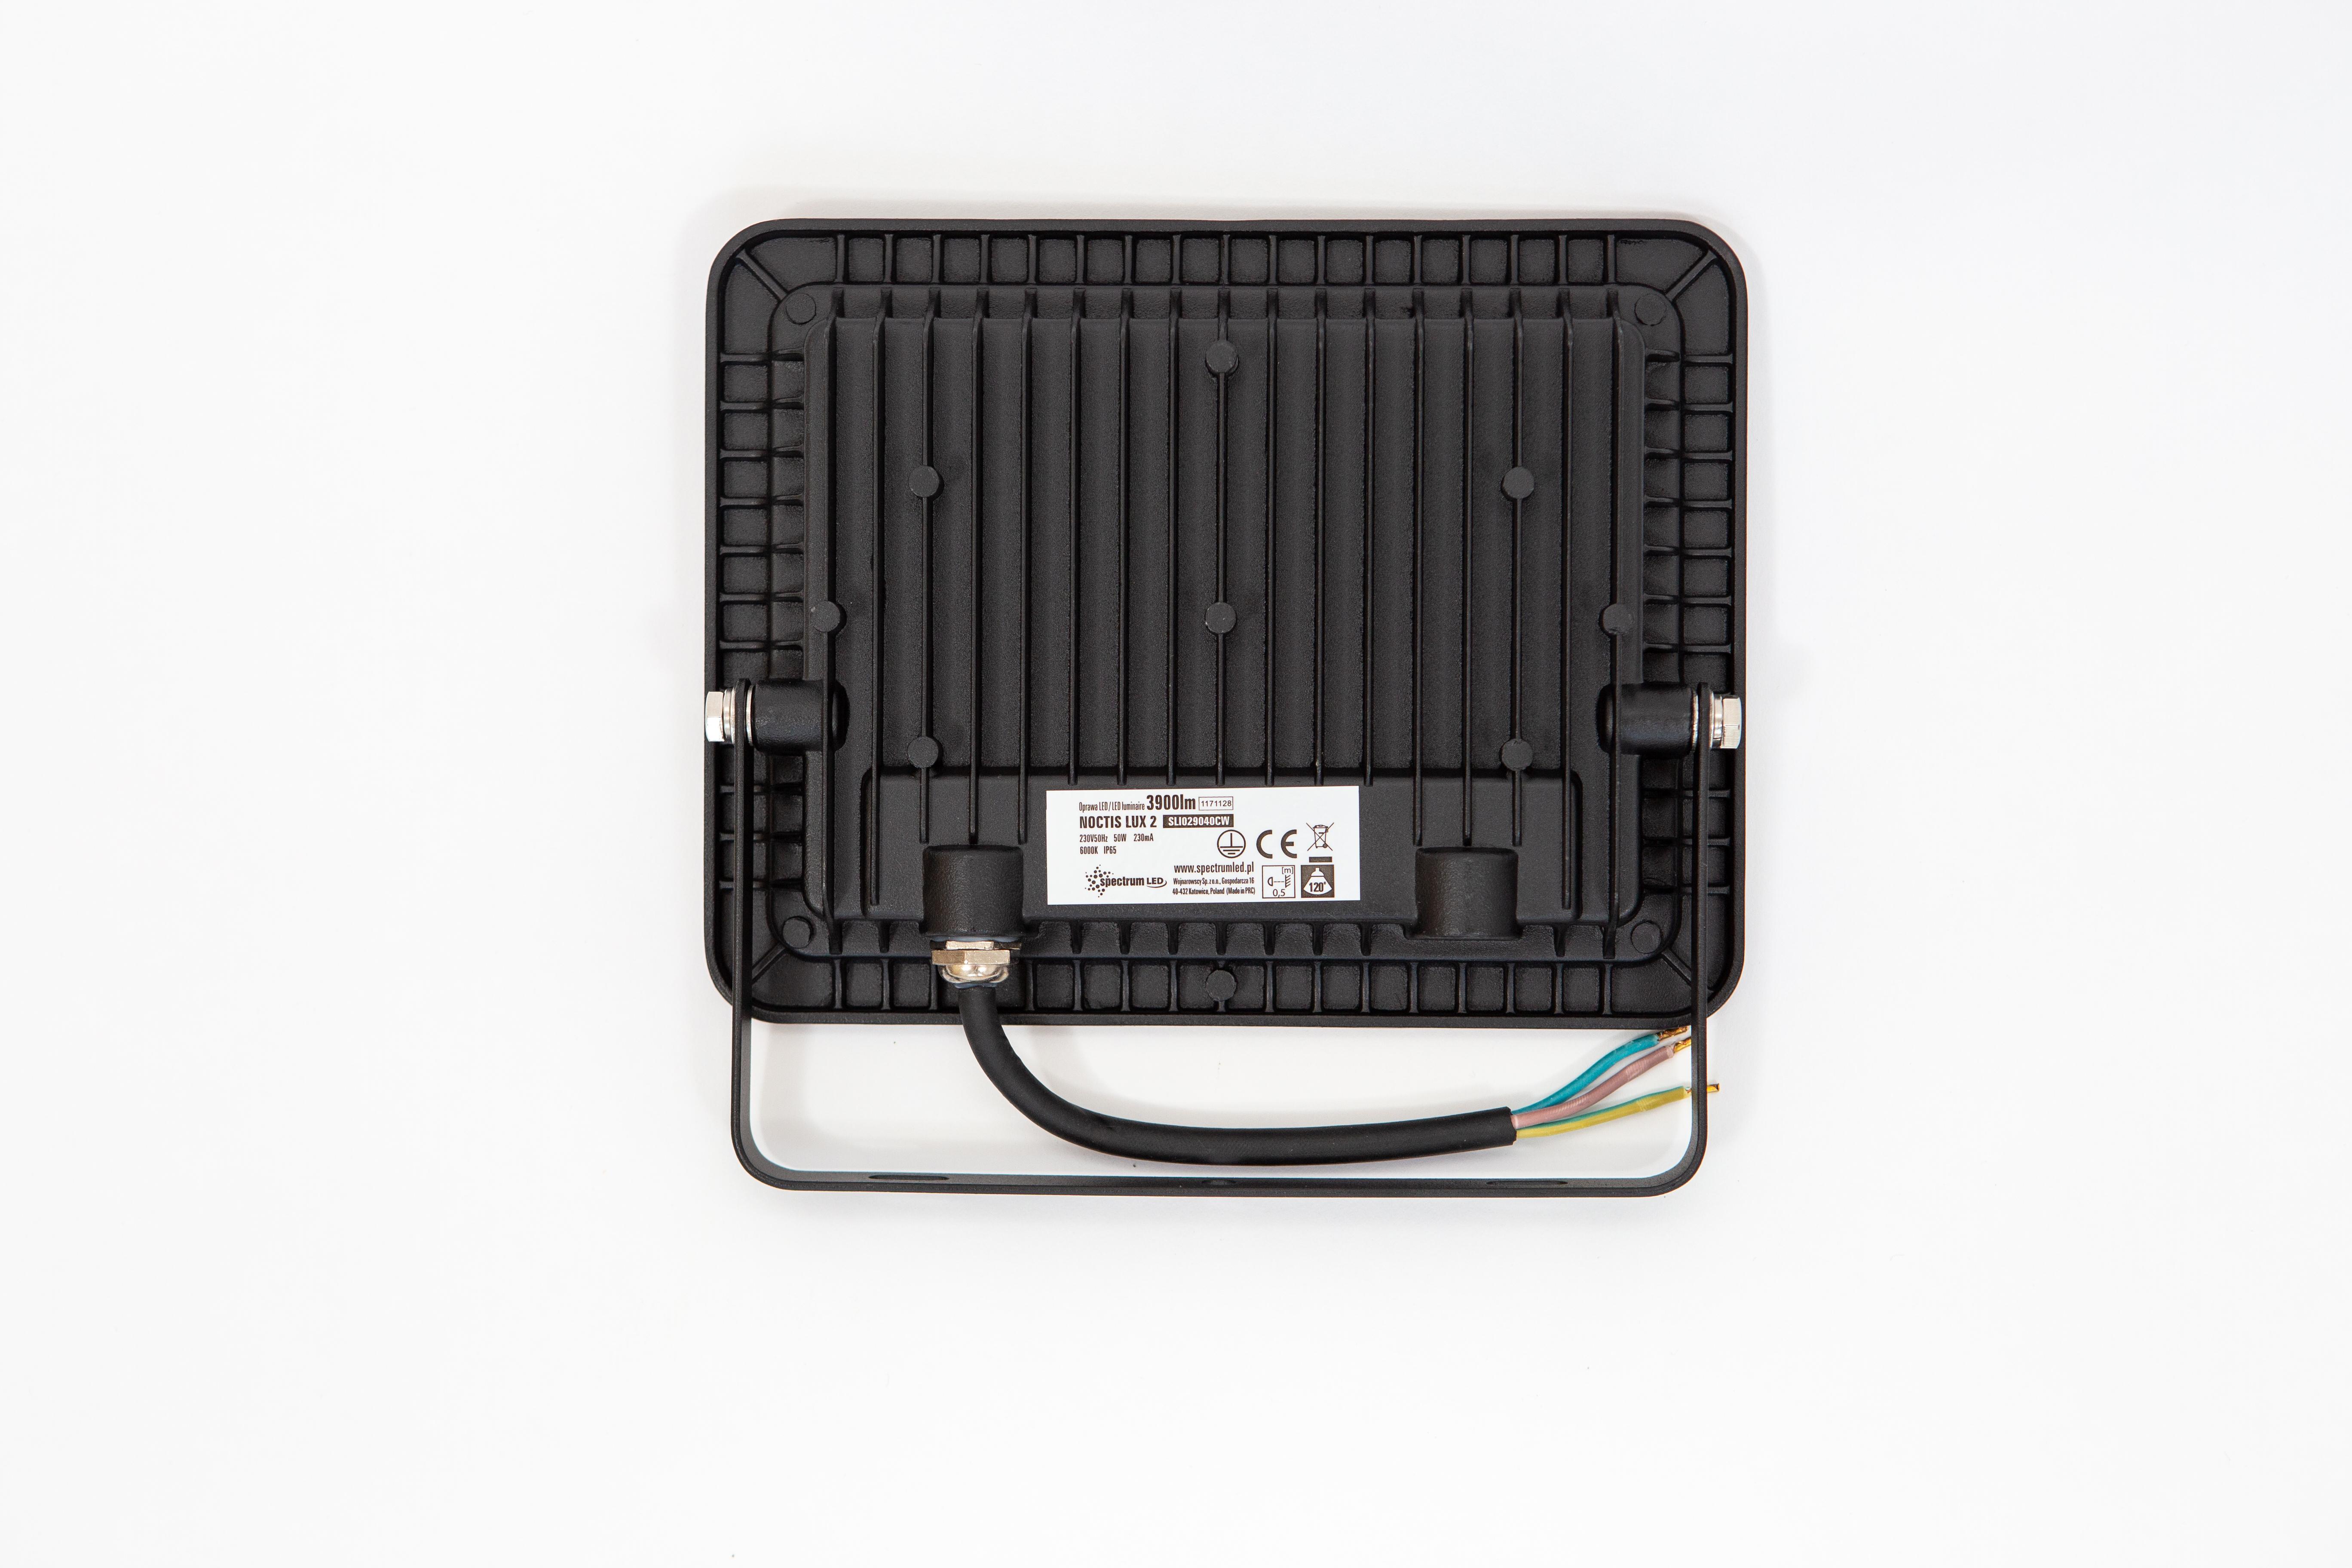 Proiector led 50W, lumina rece (6000 k ), ip 65 , clasa a++,carcasa aluminiu neagra [4]